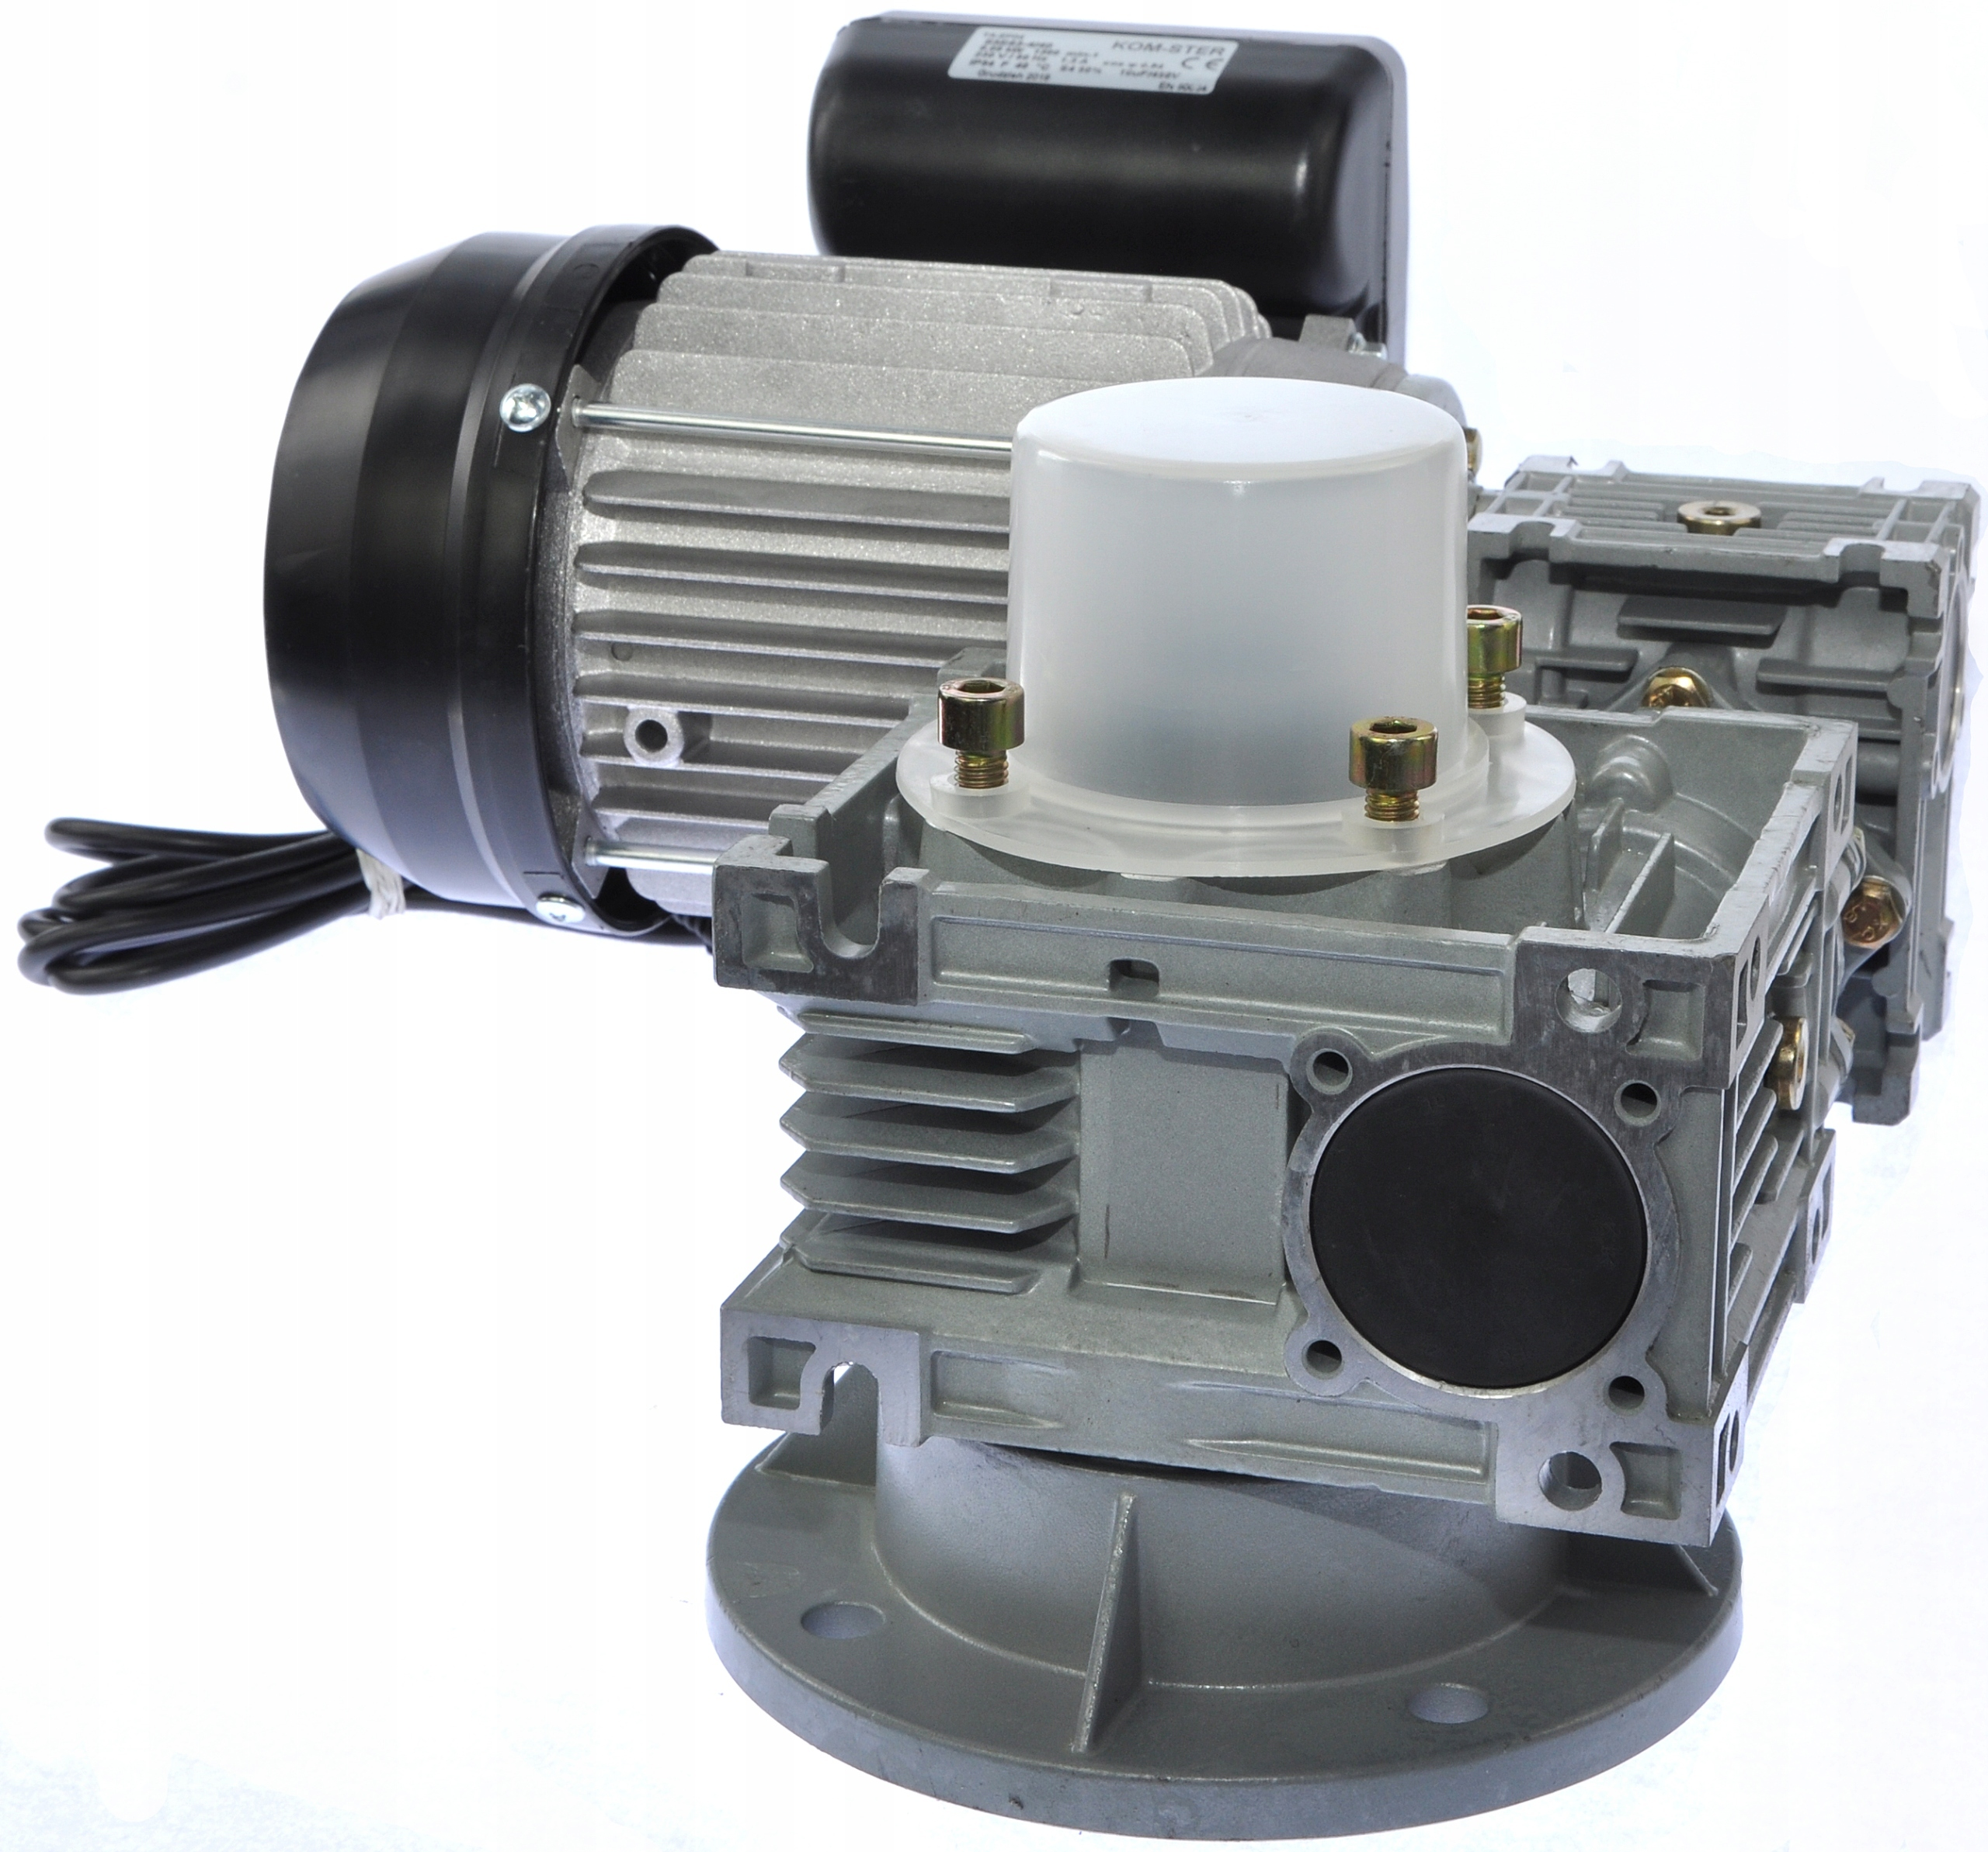 Motoreduktor, napęd do kotła, pieca. Kpl.- 0.18 KW